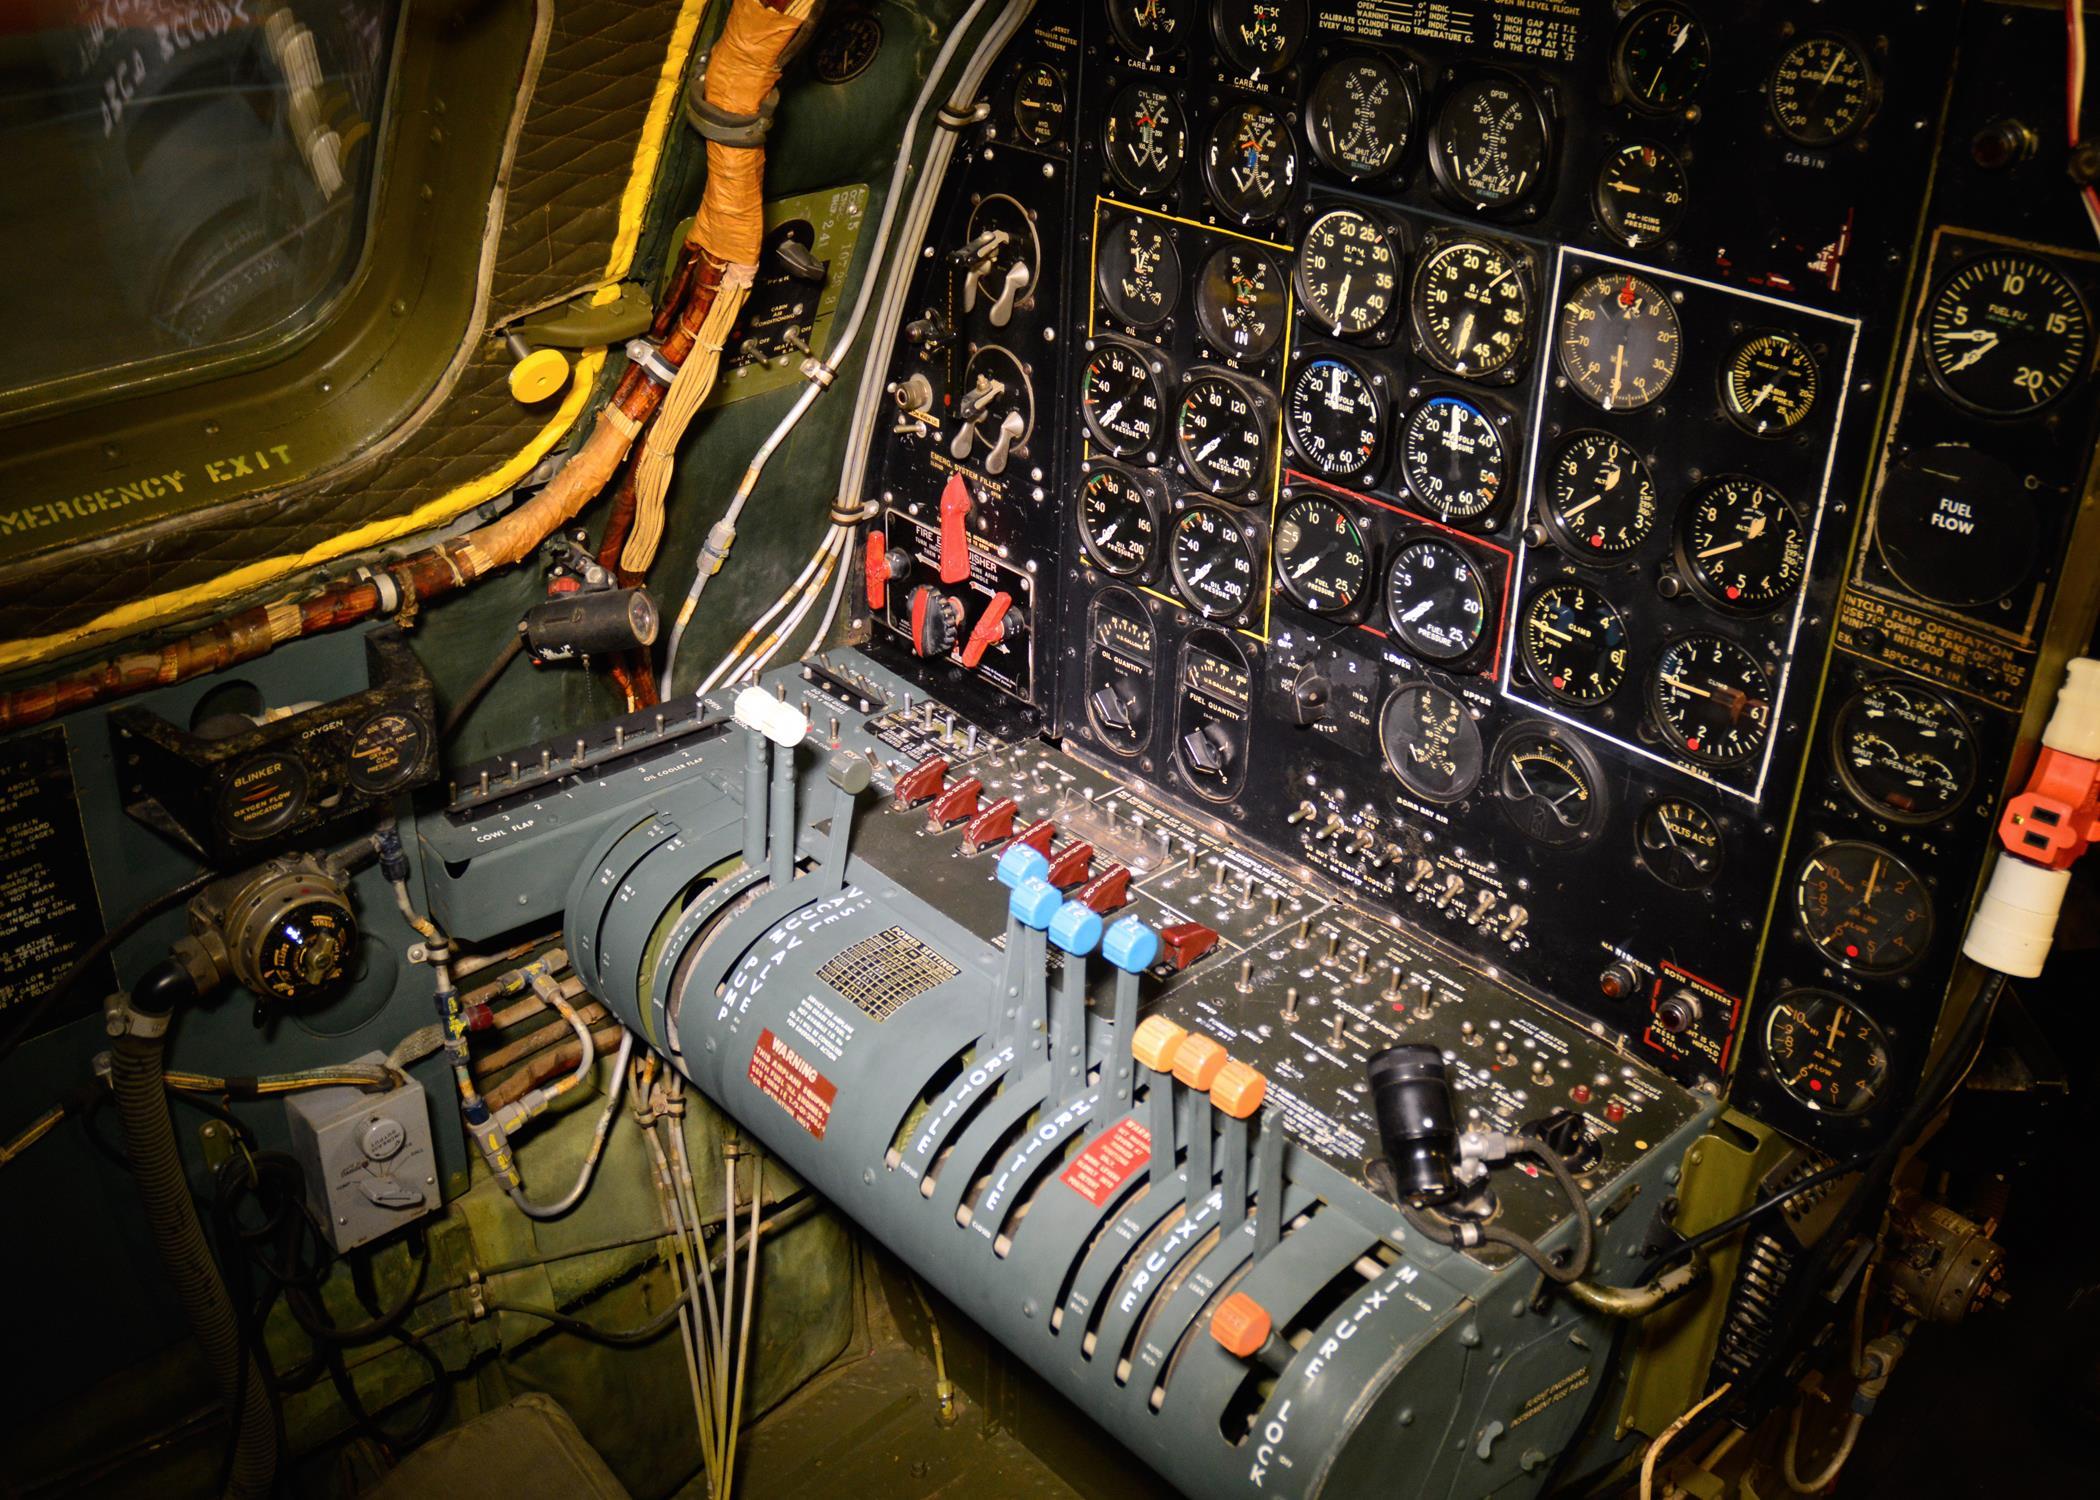 B-29 Tarzon by David Eales (Monogram 1/48) - HyperScale B 29 interior photos